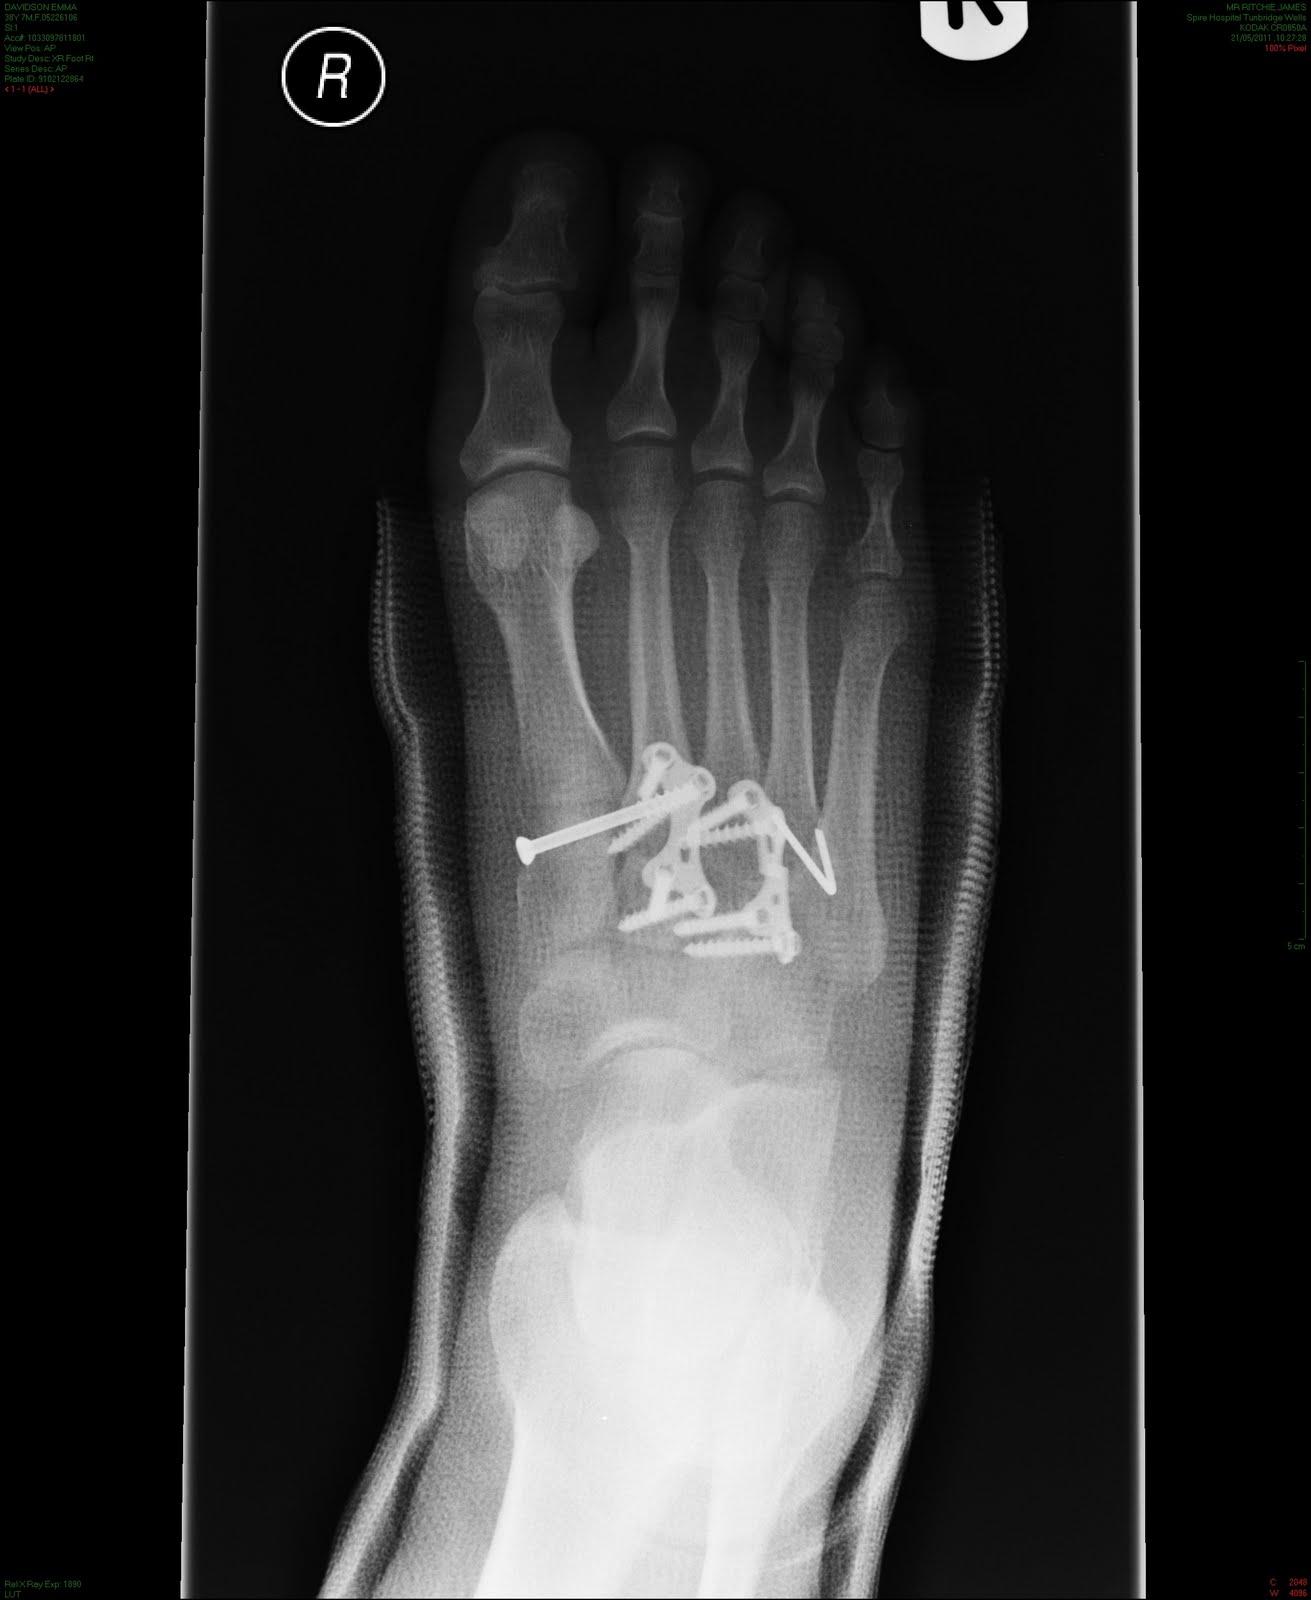 ap lisfranc fracture xray post op lateral lisfranc fracture post-2.bp.blogspot.com